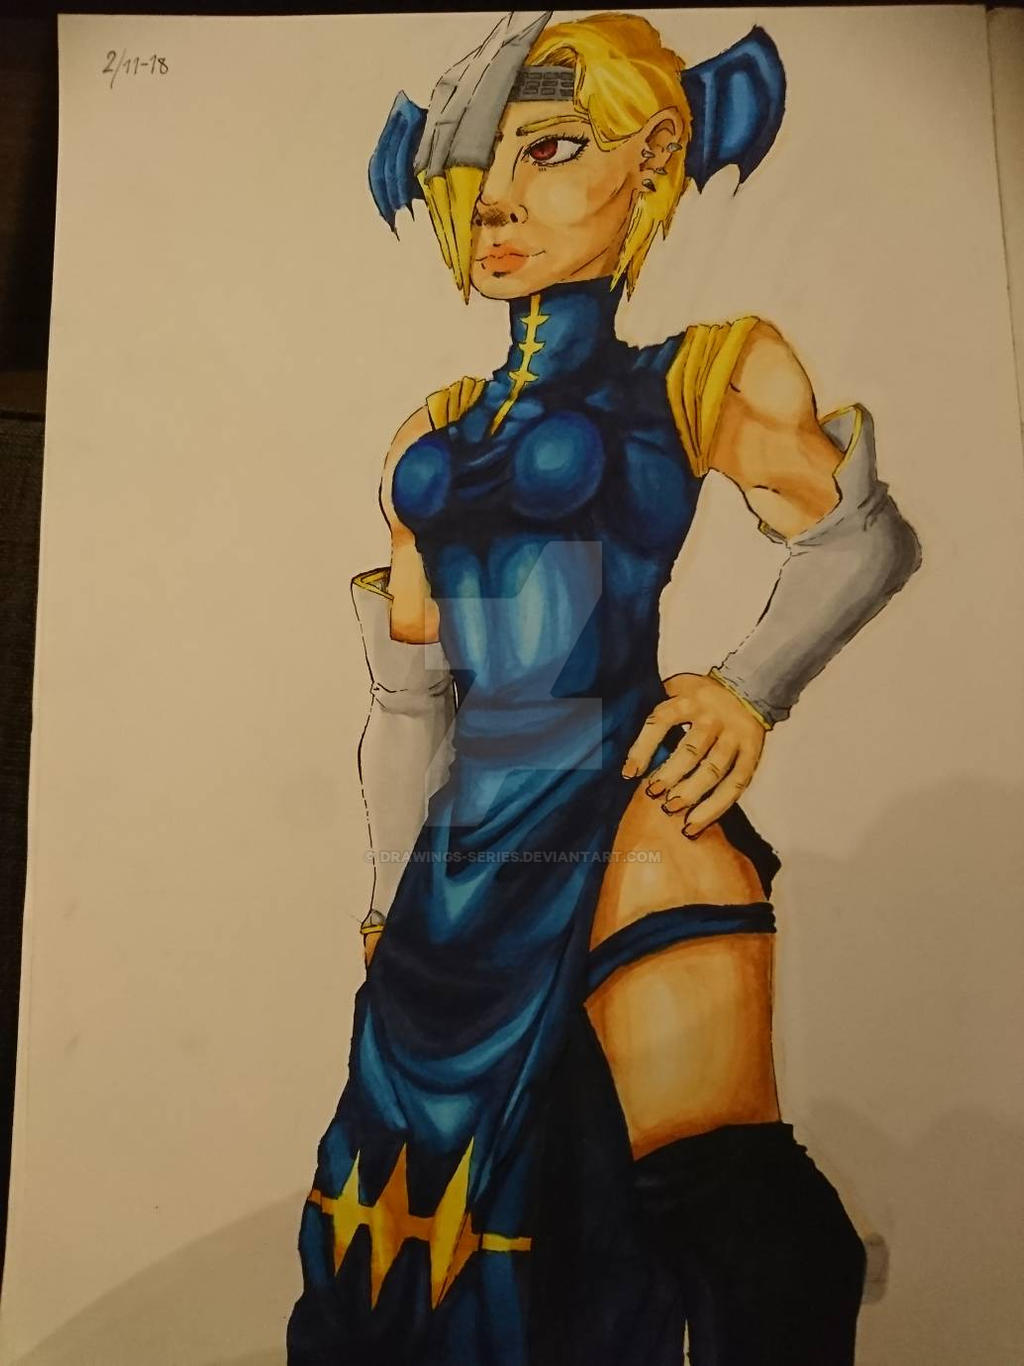 Ryukyu From Bnha By Drawings Series On Deviantart